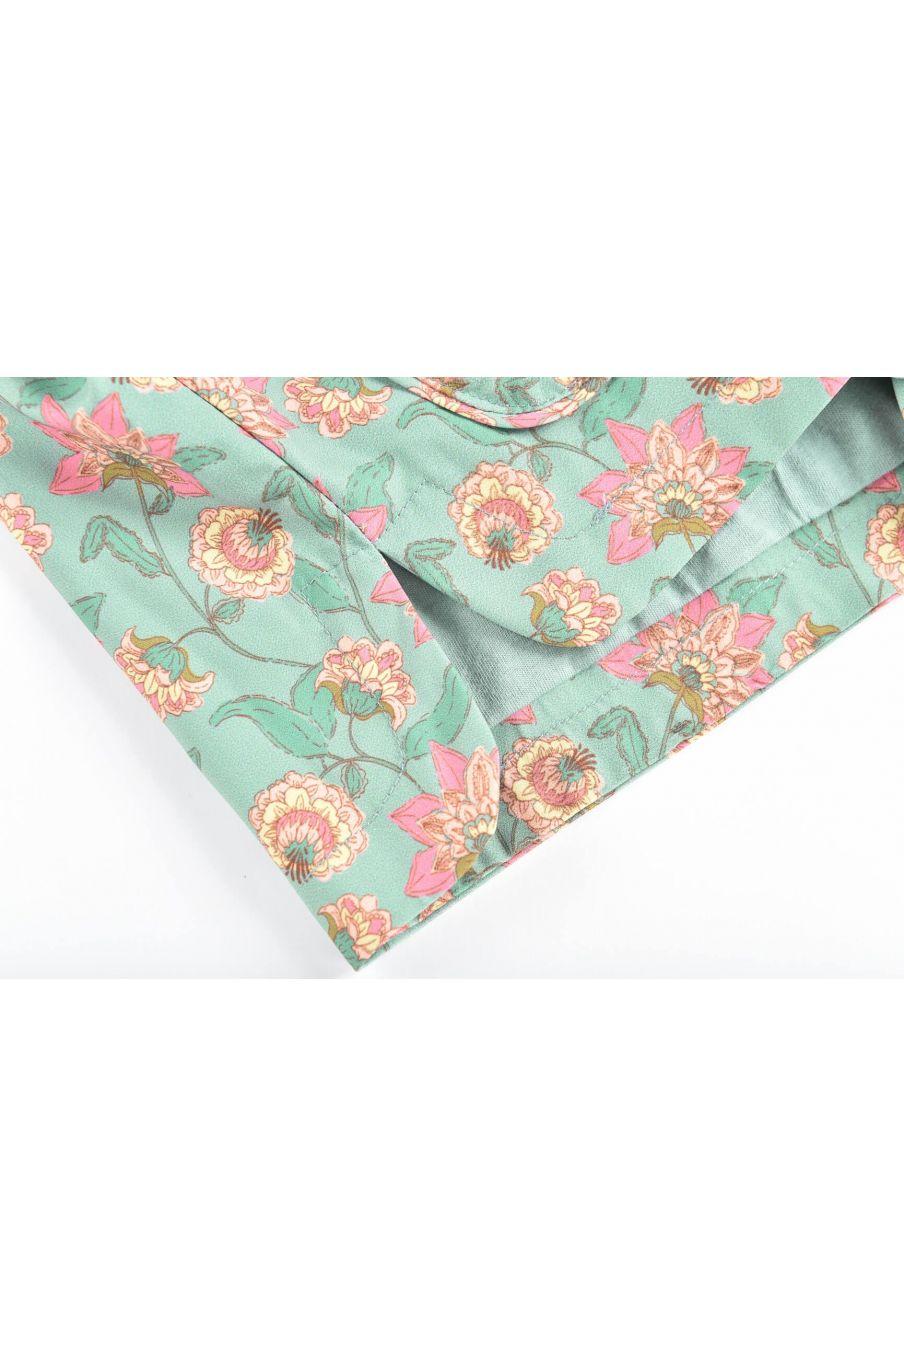 boheme chic vintage imperméable fille manoukia turquoise flowers